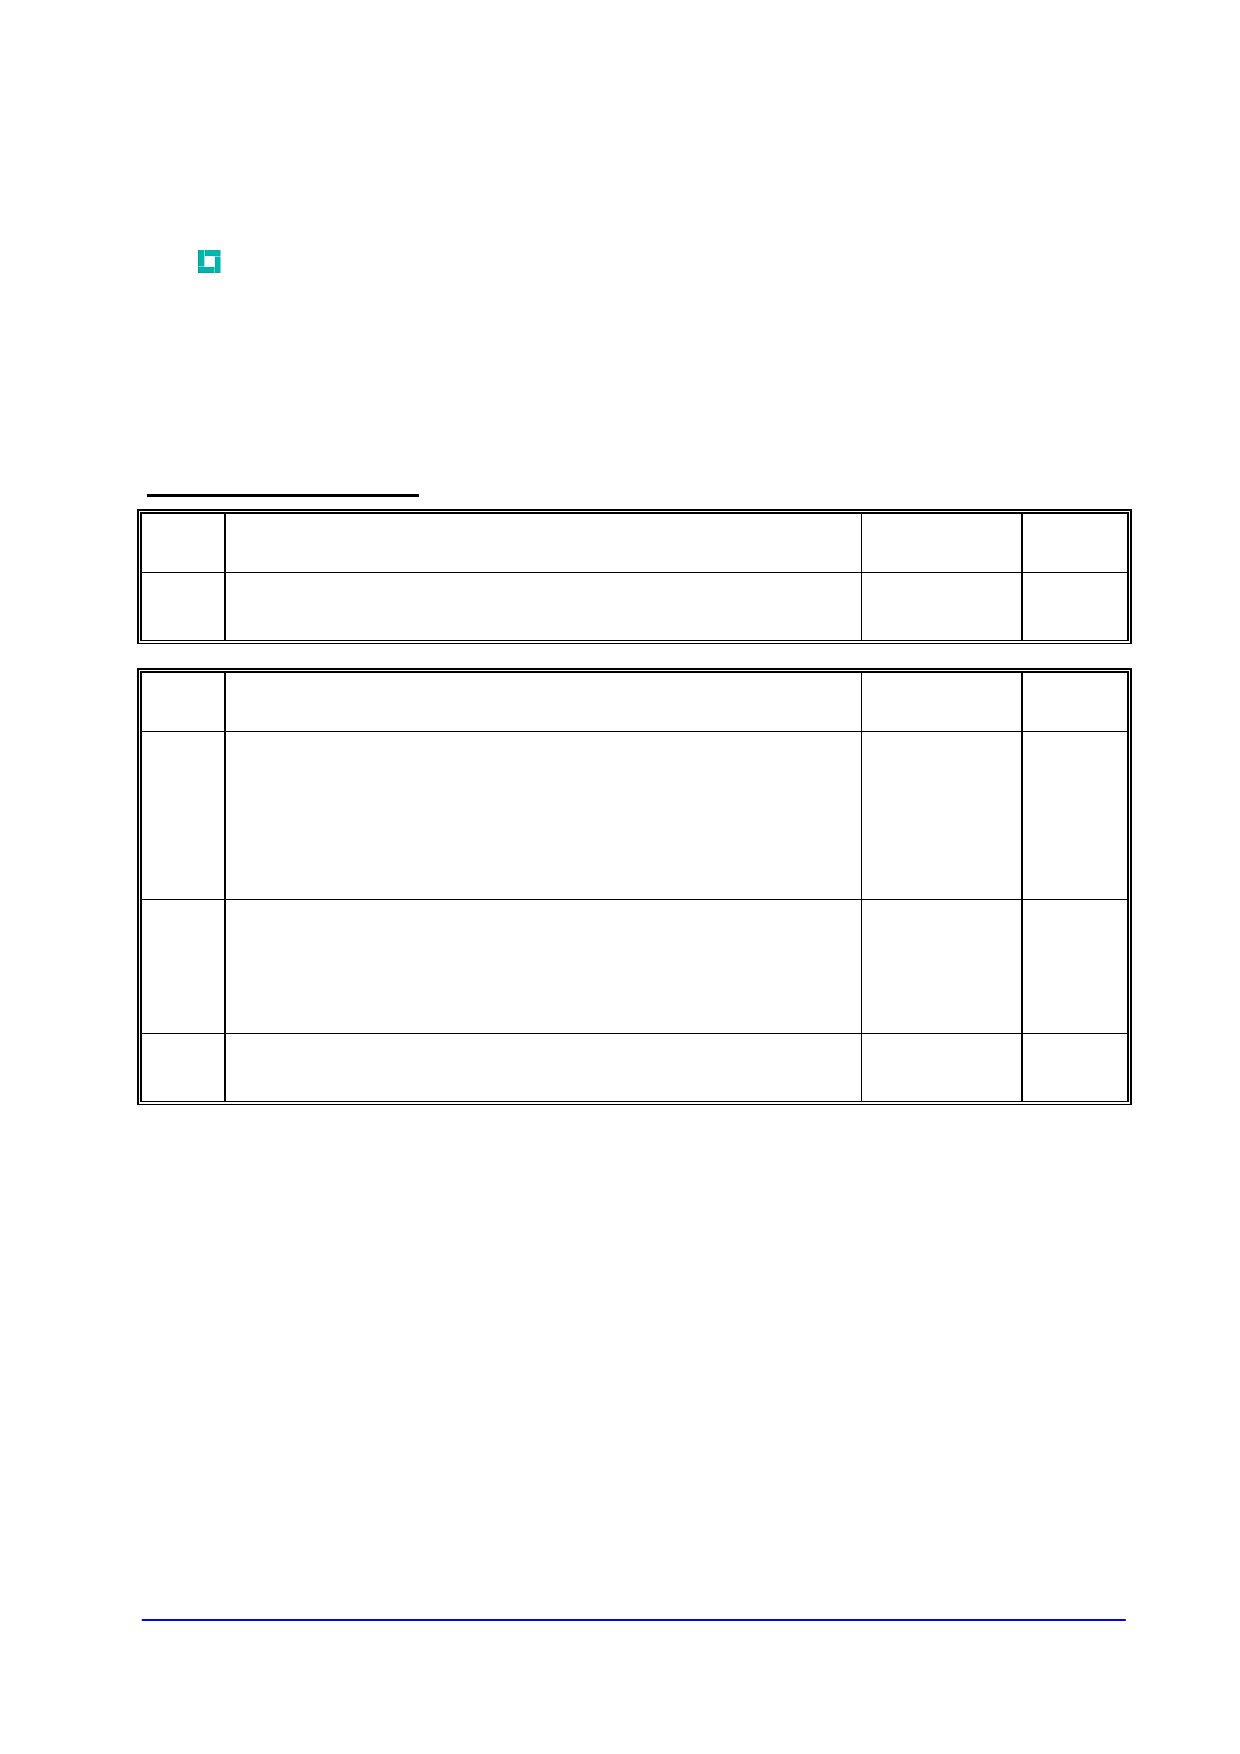 W4096ZT360 Datenblatt PDF